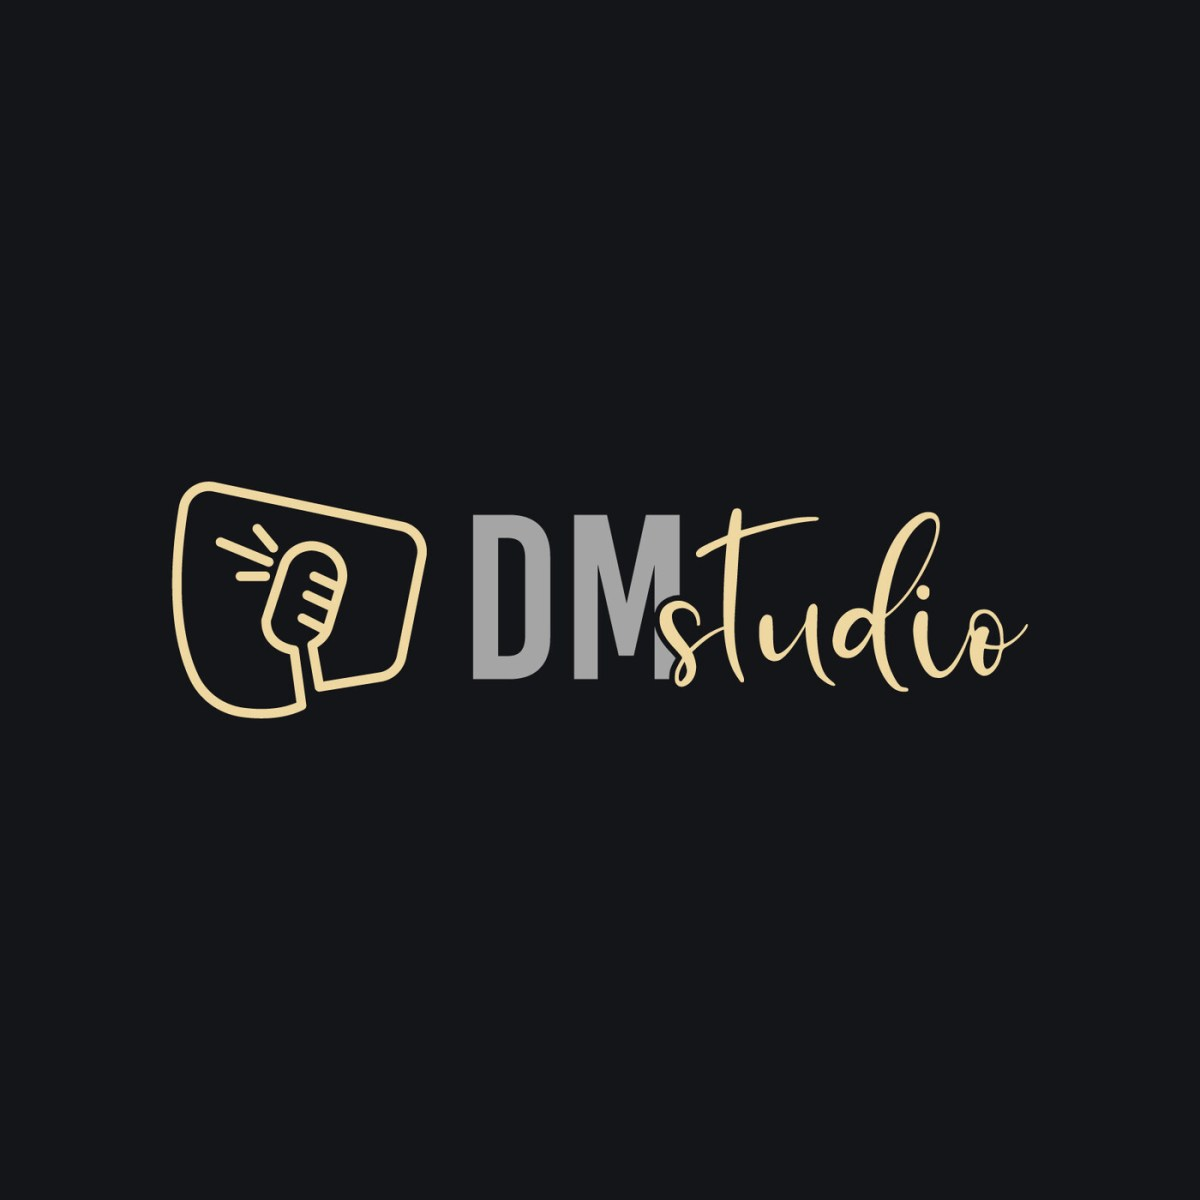 DM Studio